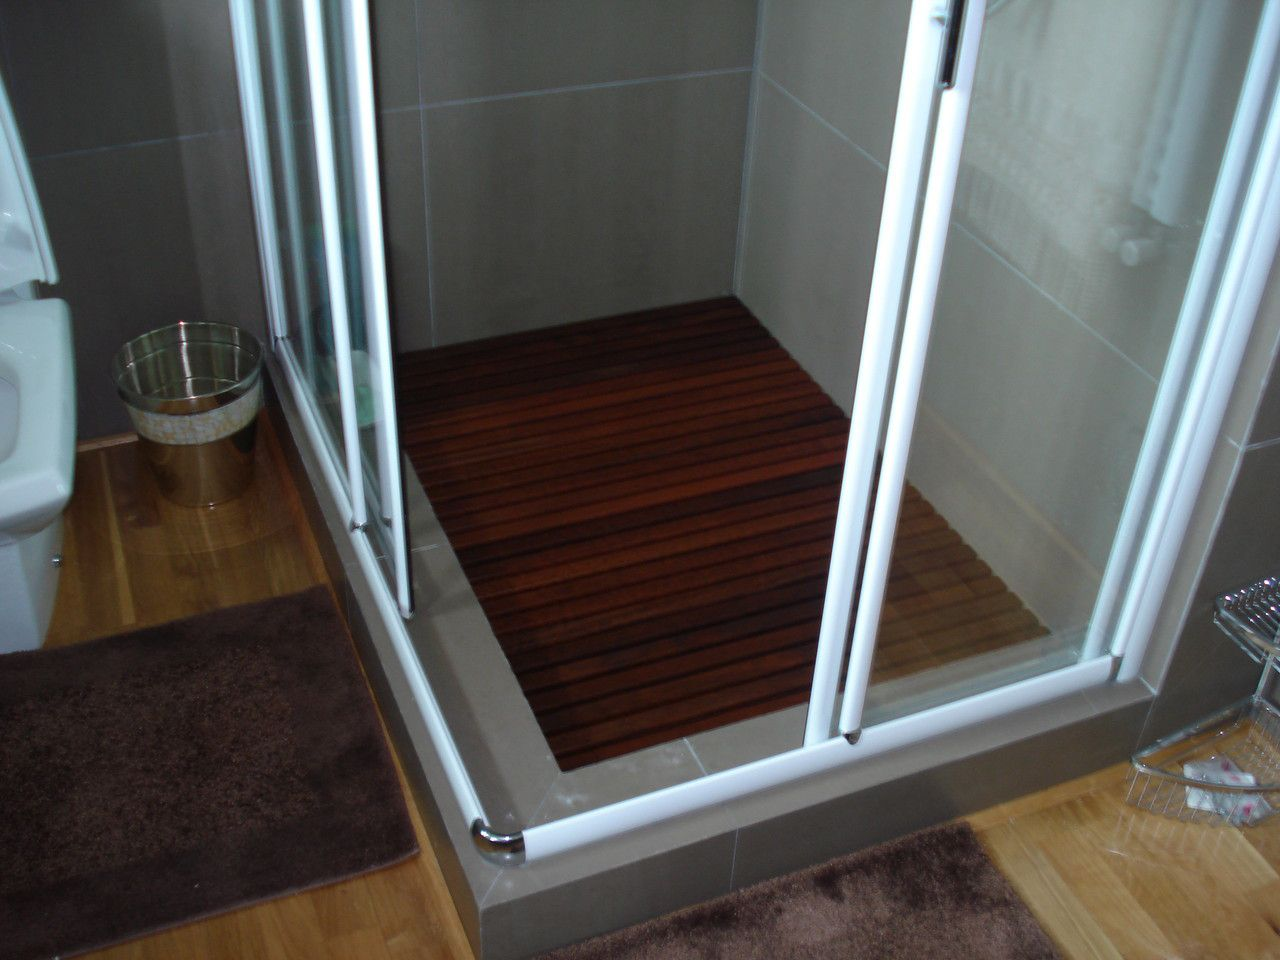 Deck De Madeira Chuveiro Box Banheiro Capacho 125x58 cm Sem Pintura Acabamento Lixado